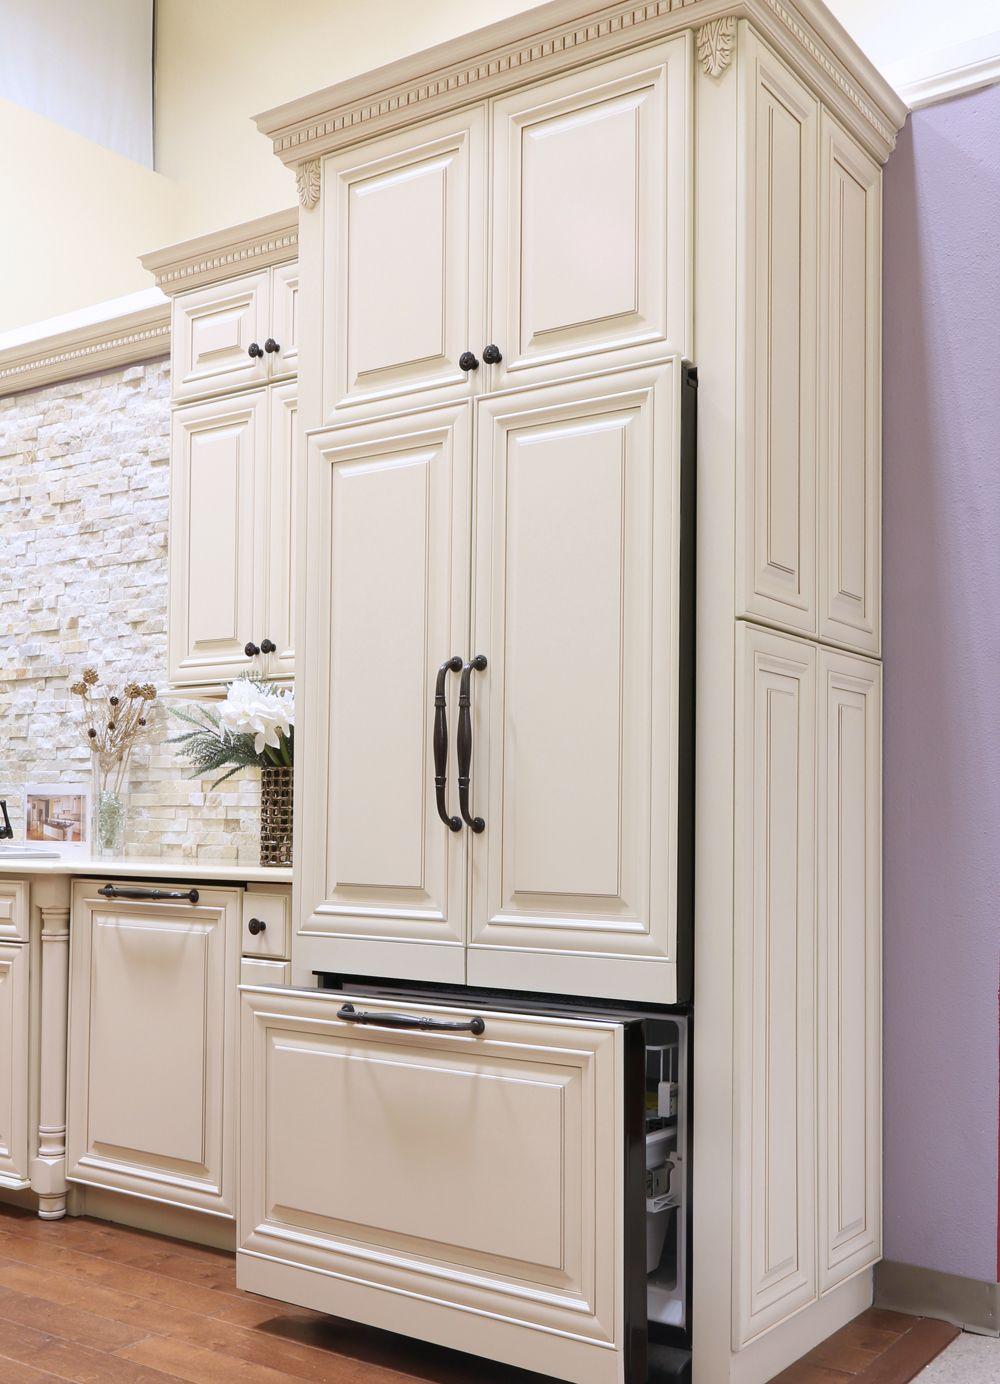 Crème Maple Glazed Cabinet | Glazed kitchen cabinets ...